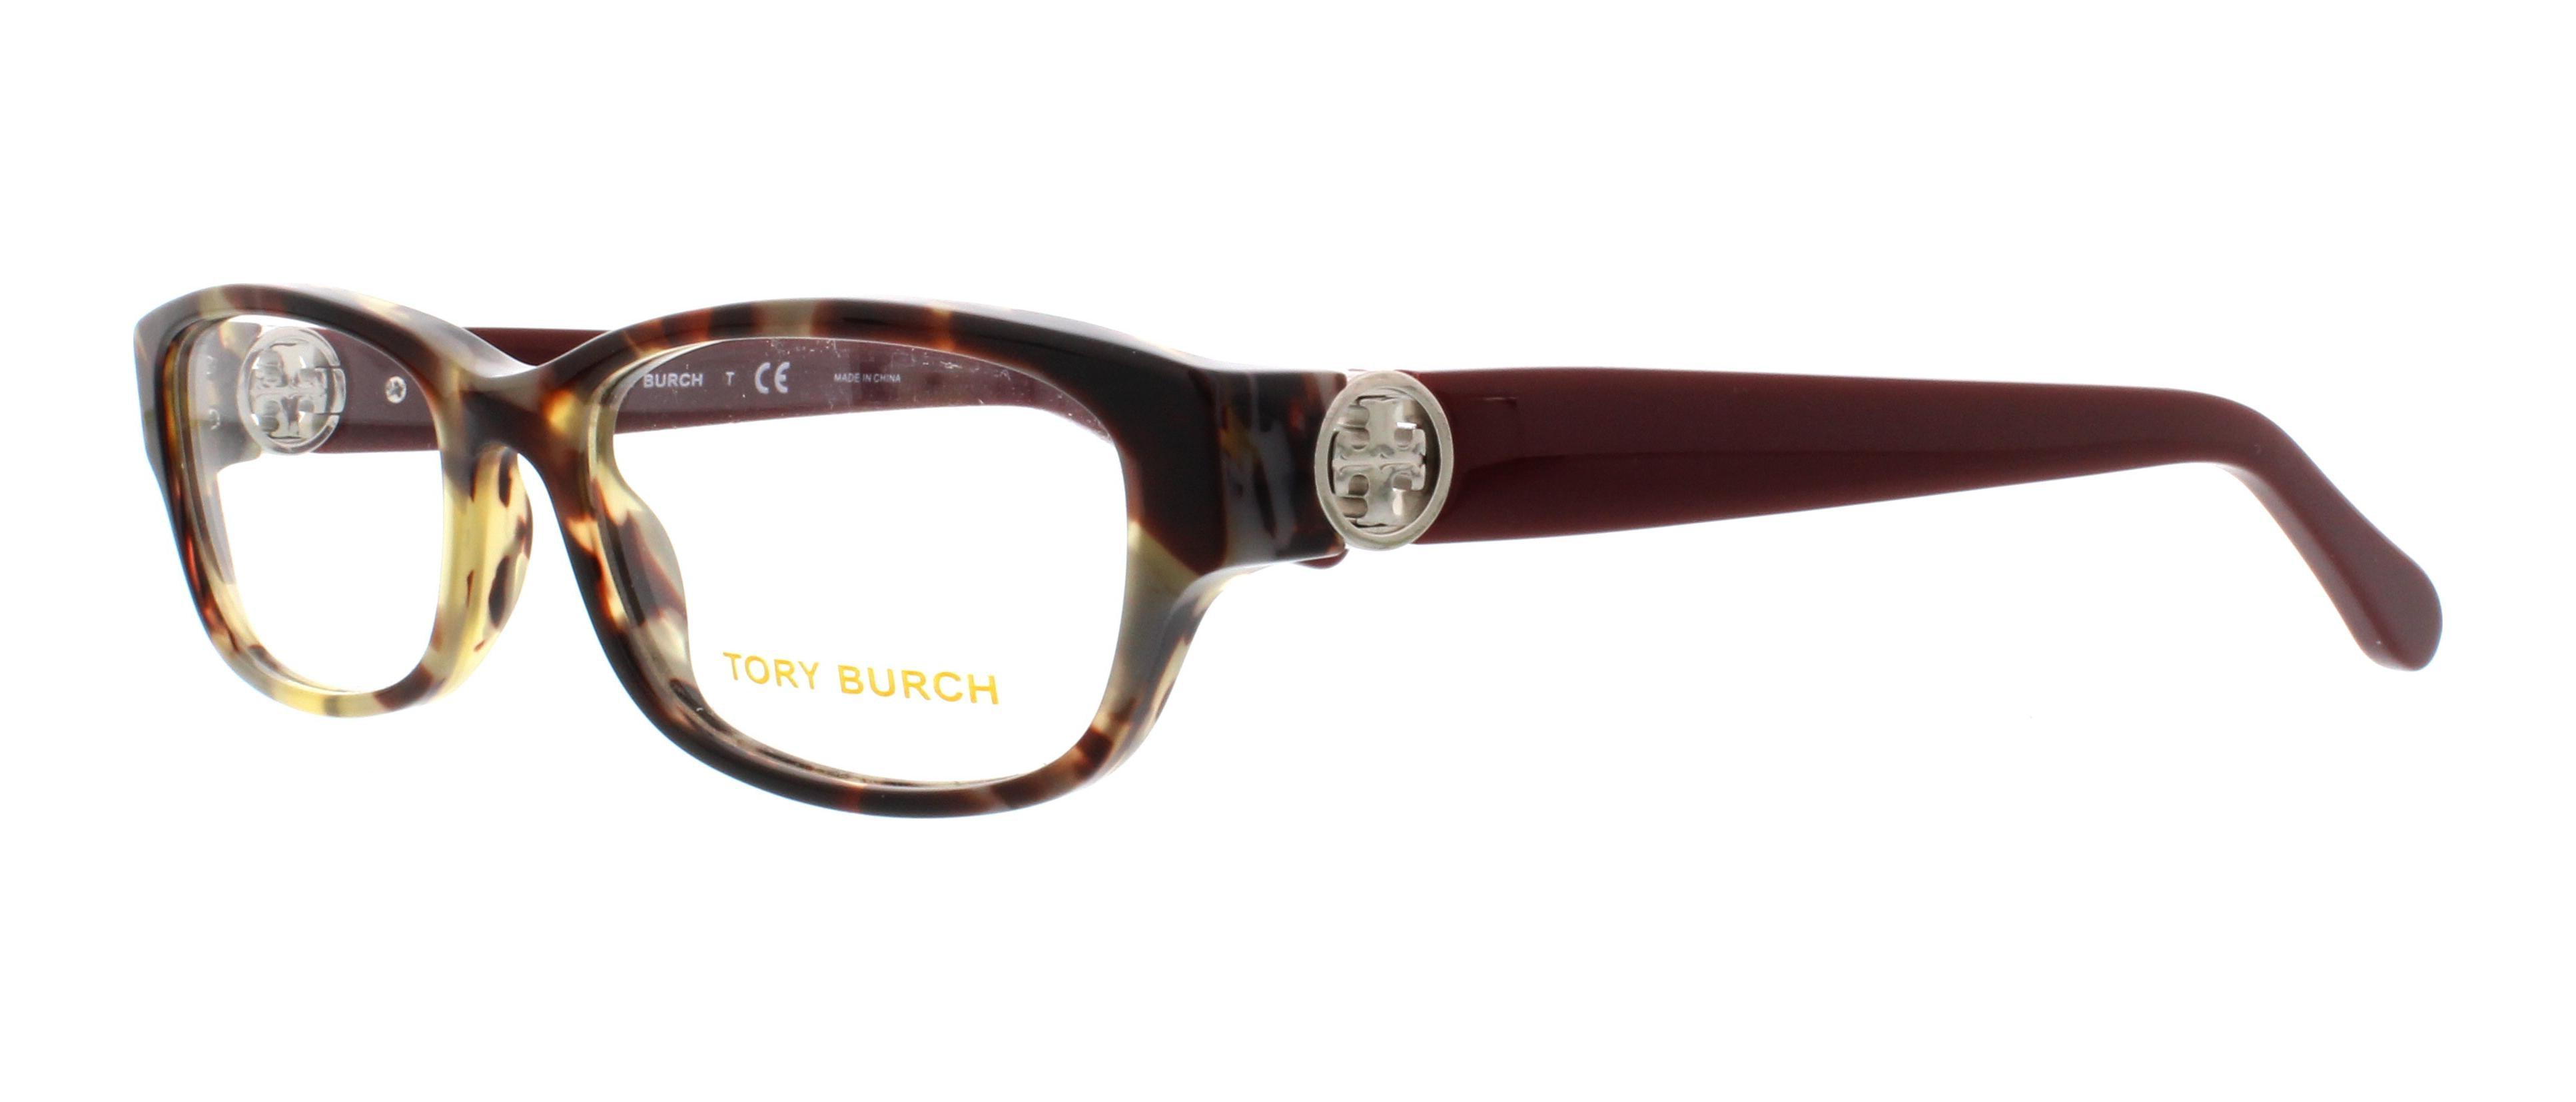 TORY BURCH Eyeglasses TY 2055 1476 Porchini Tortoise/Bordeaux 51MM ...